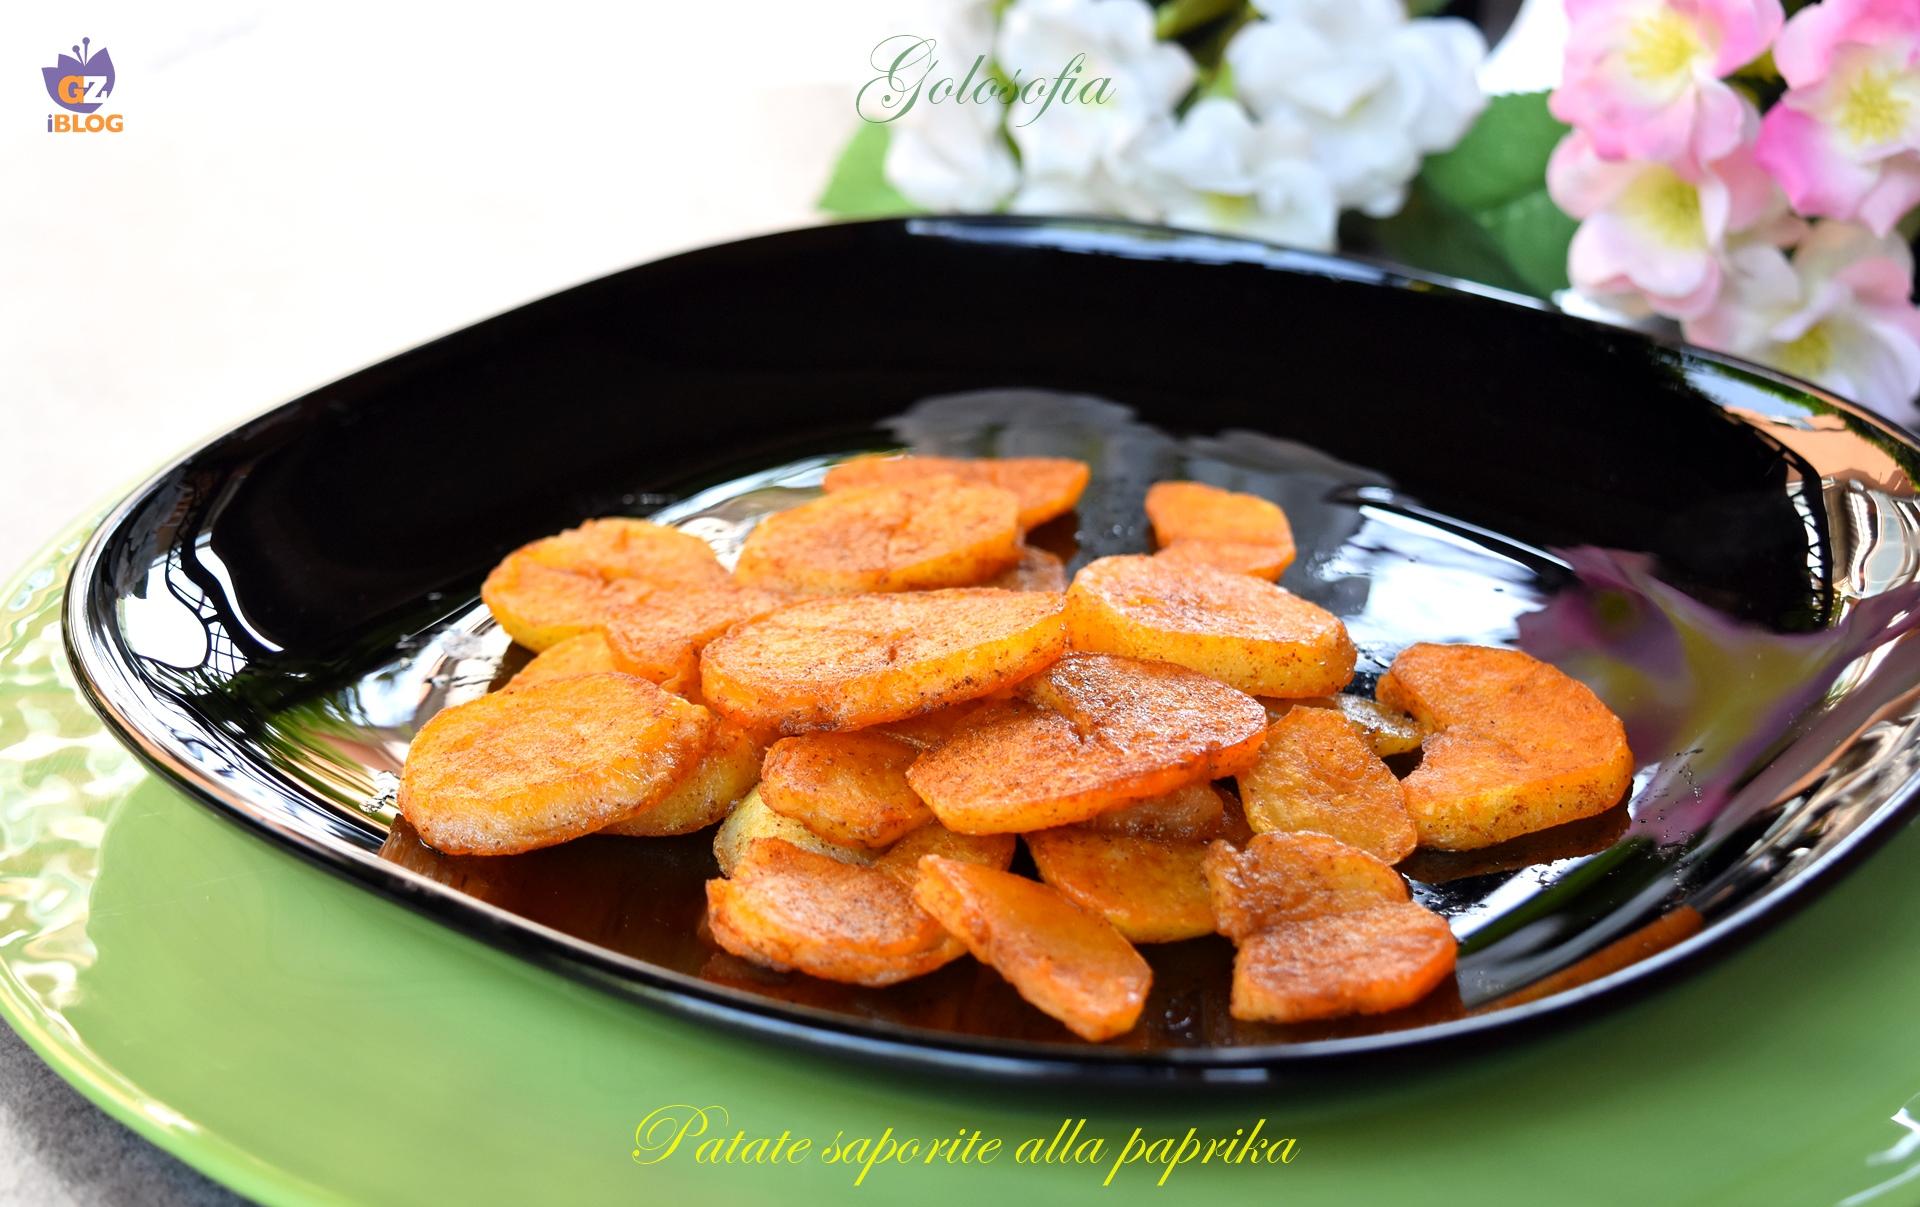 Patate saporite alla paprika-ricetta contorni-golosofia